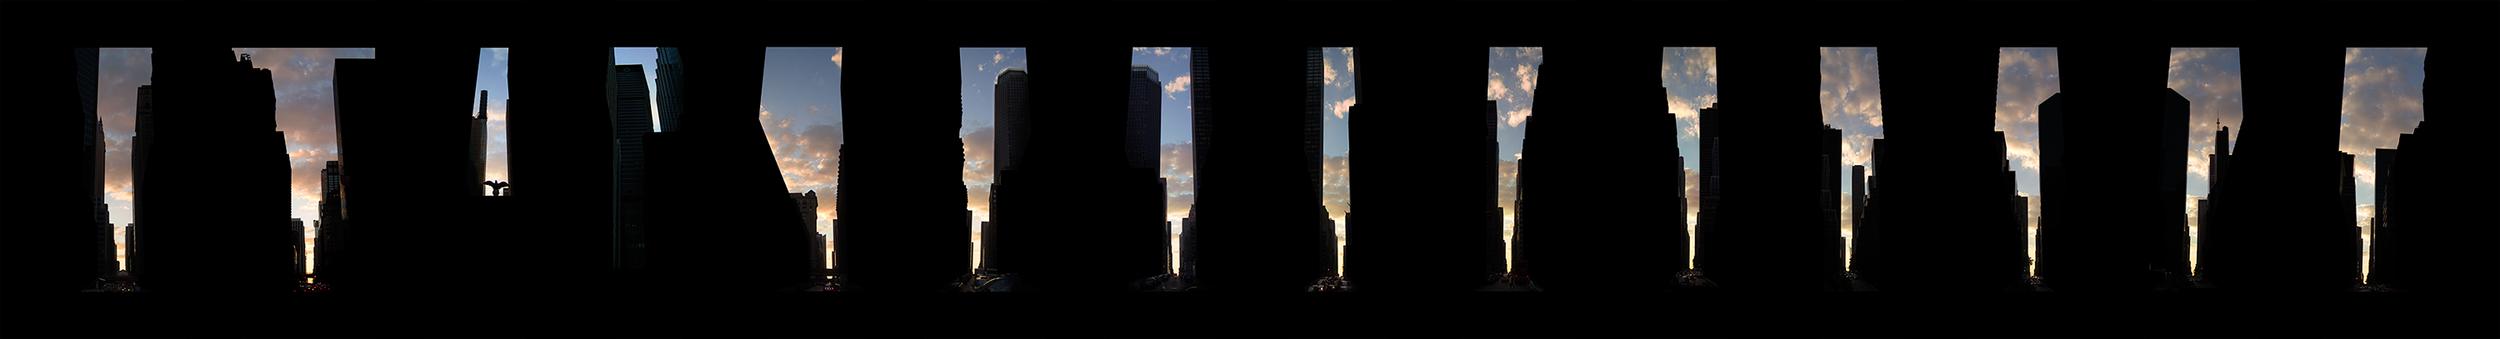 "41st -54th Streets  ,14 c-prints 7 x 5"" each, 2004"